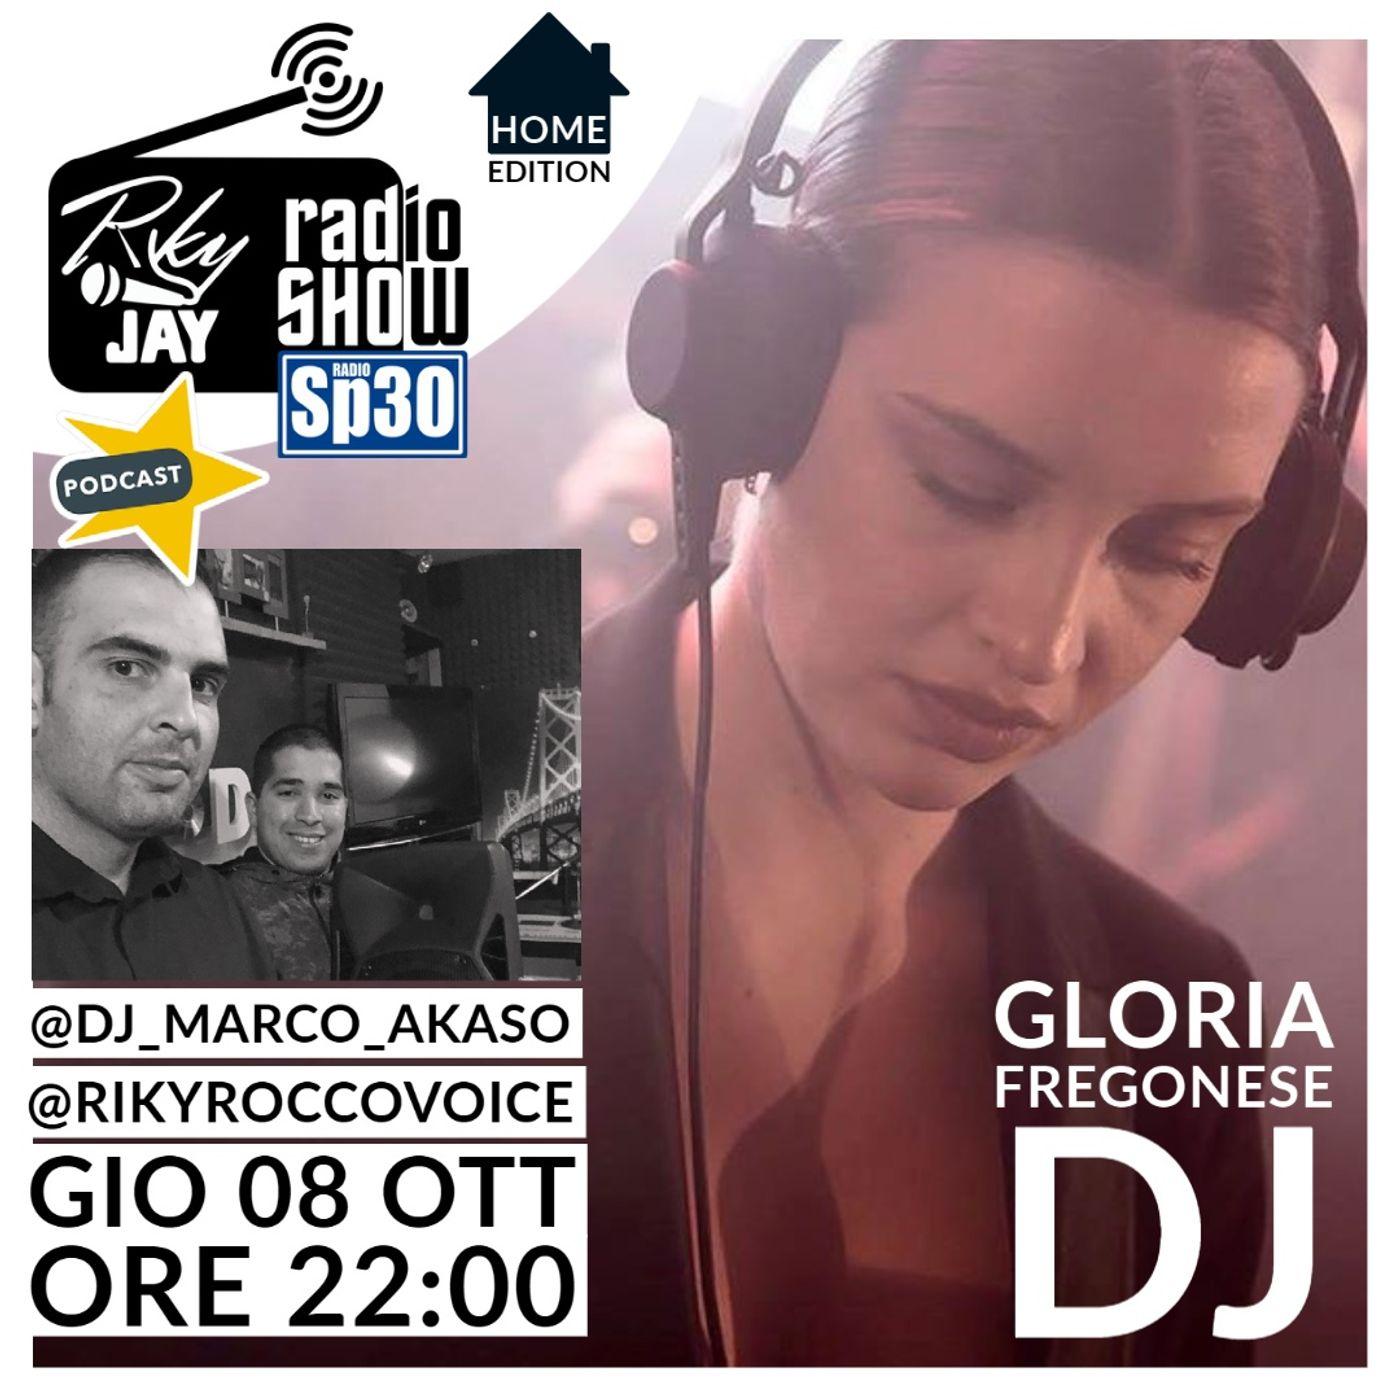 RikyJay Radio Show - ST.2 N.42 -  ospite Gloria Fregonese